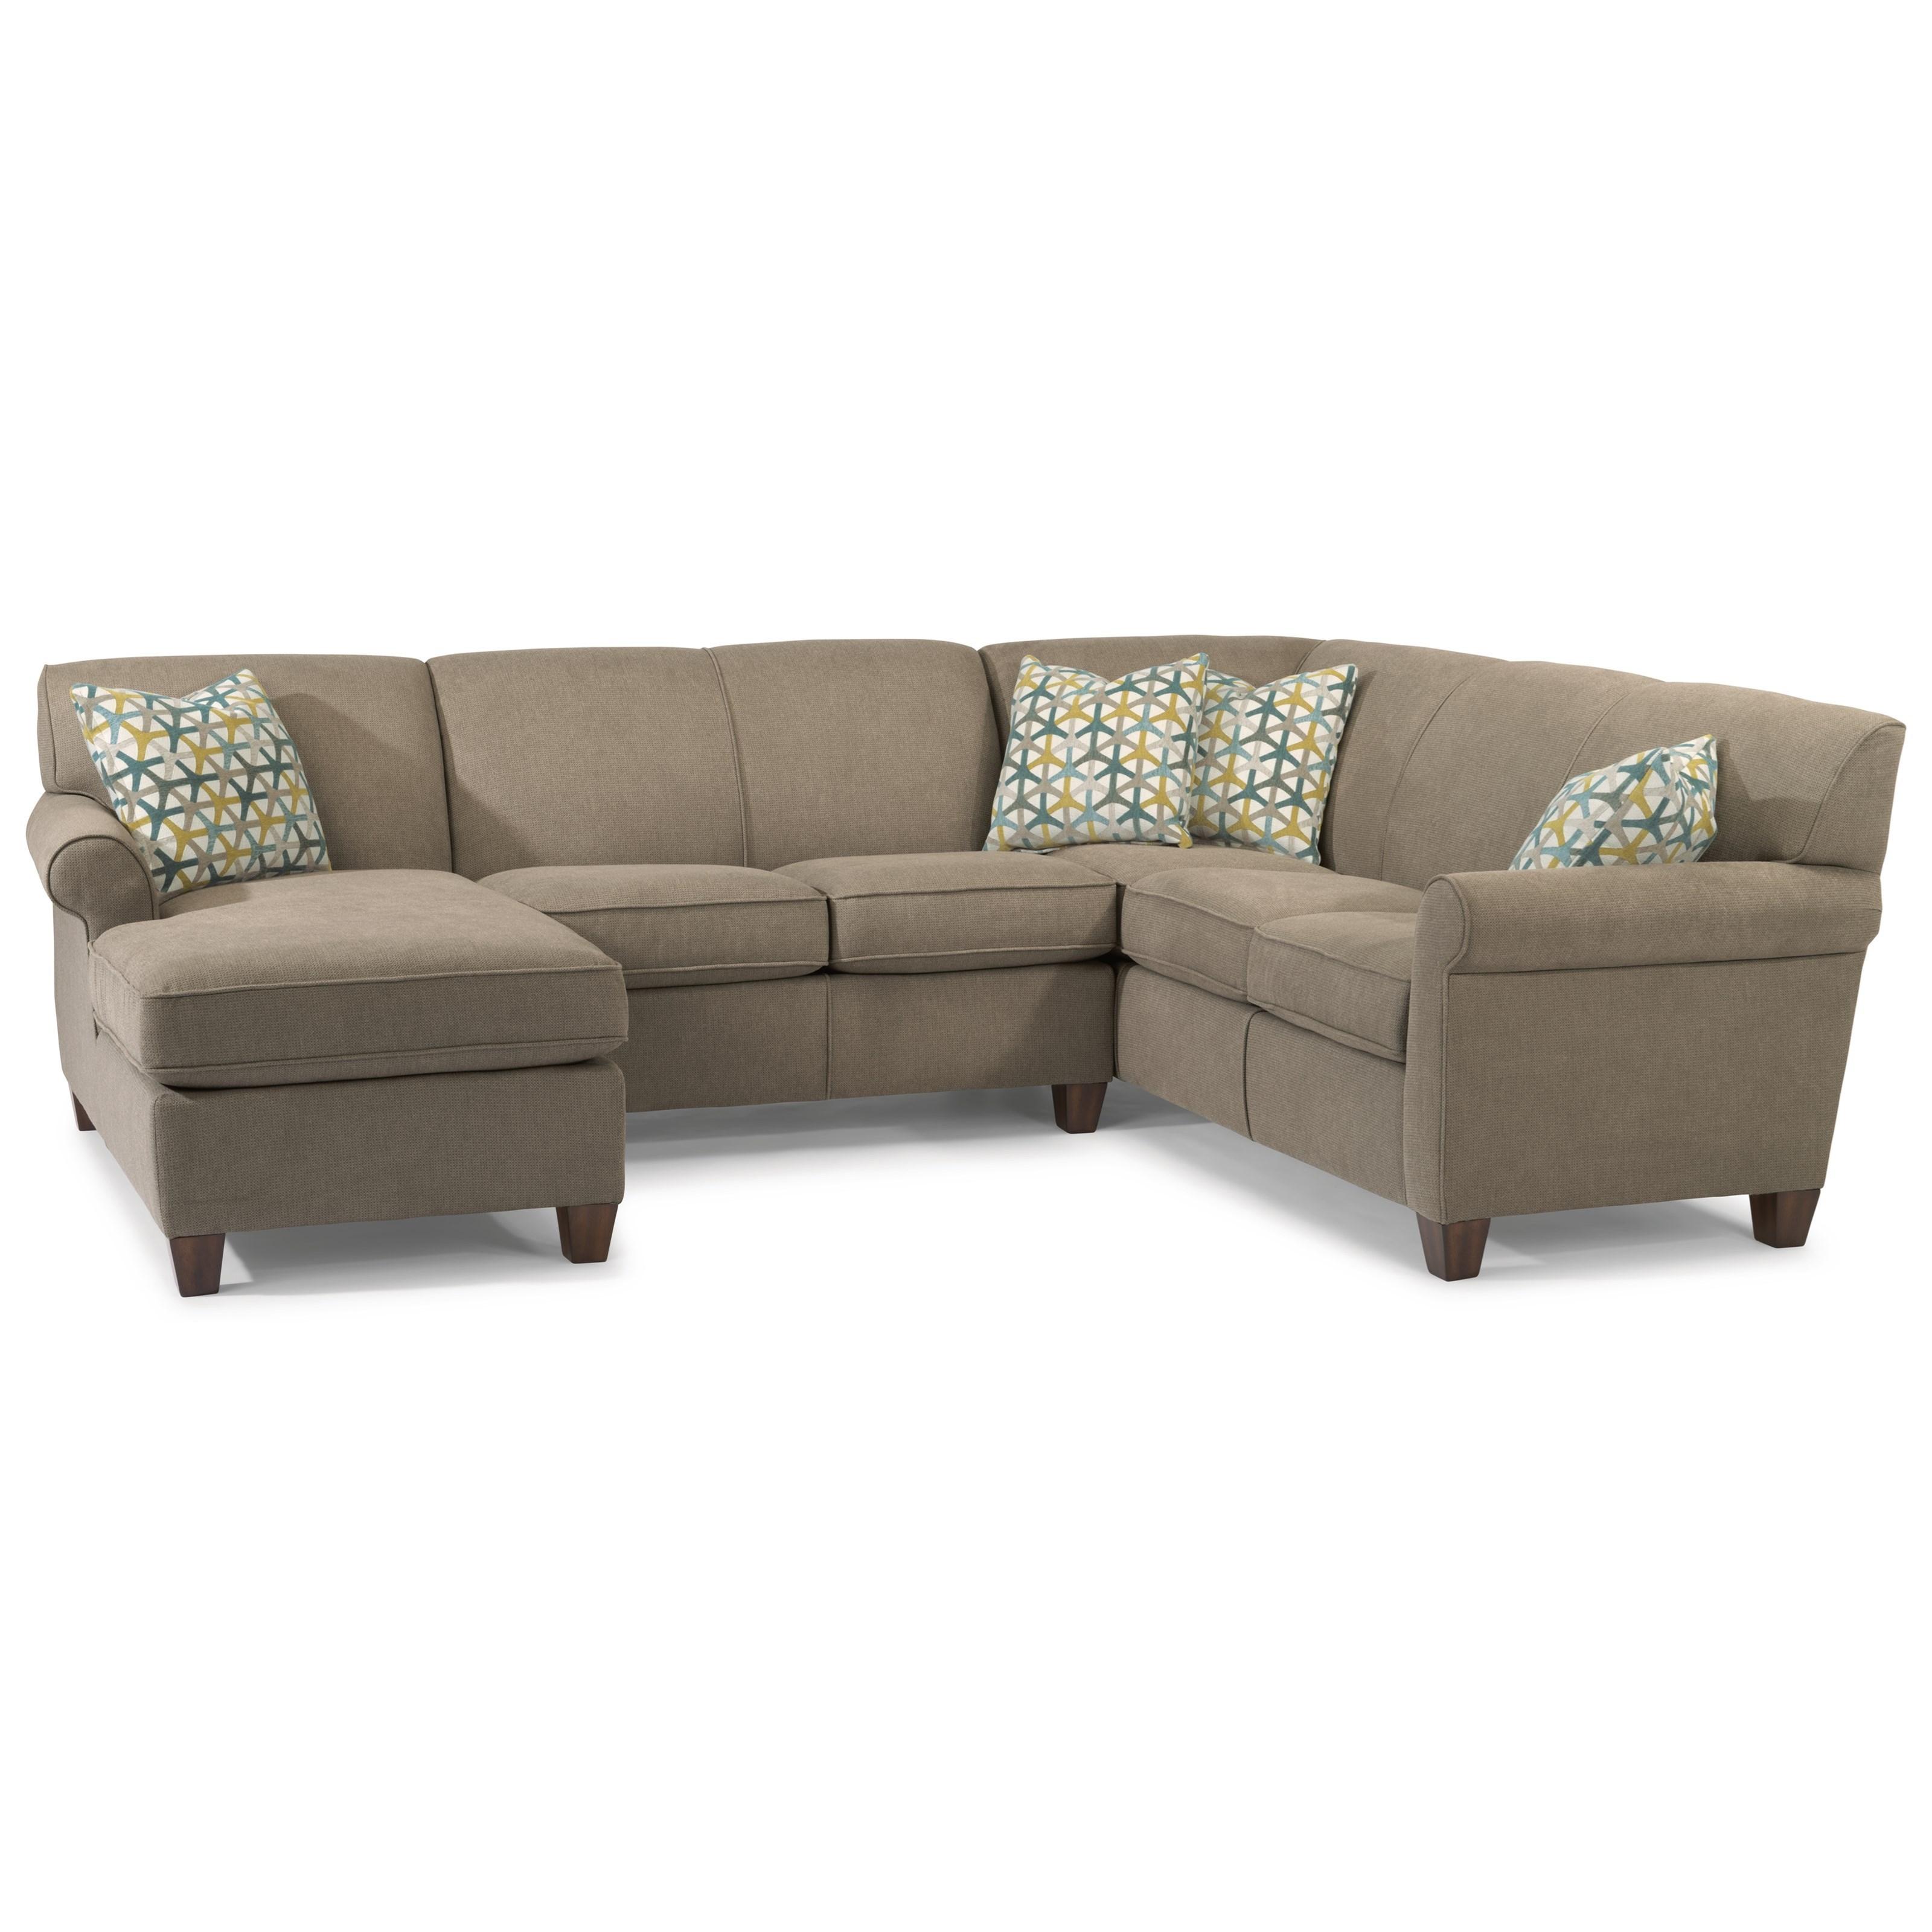 Dana 3-Piece Sectional by Flexsteel at Mueller Furniture